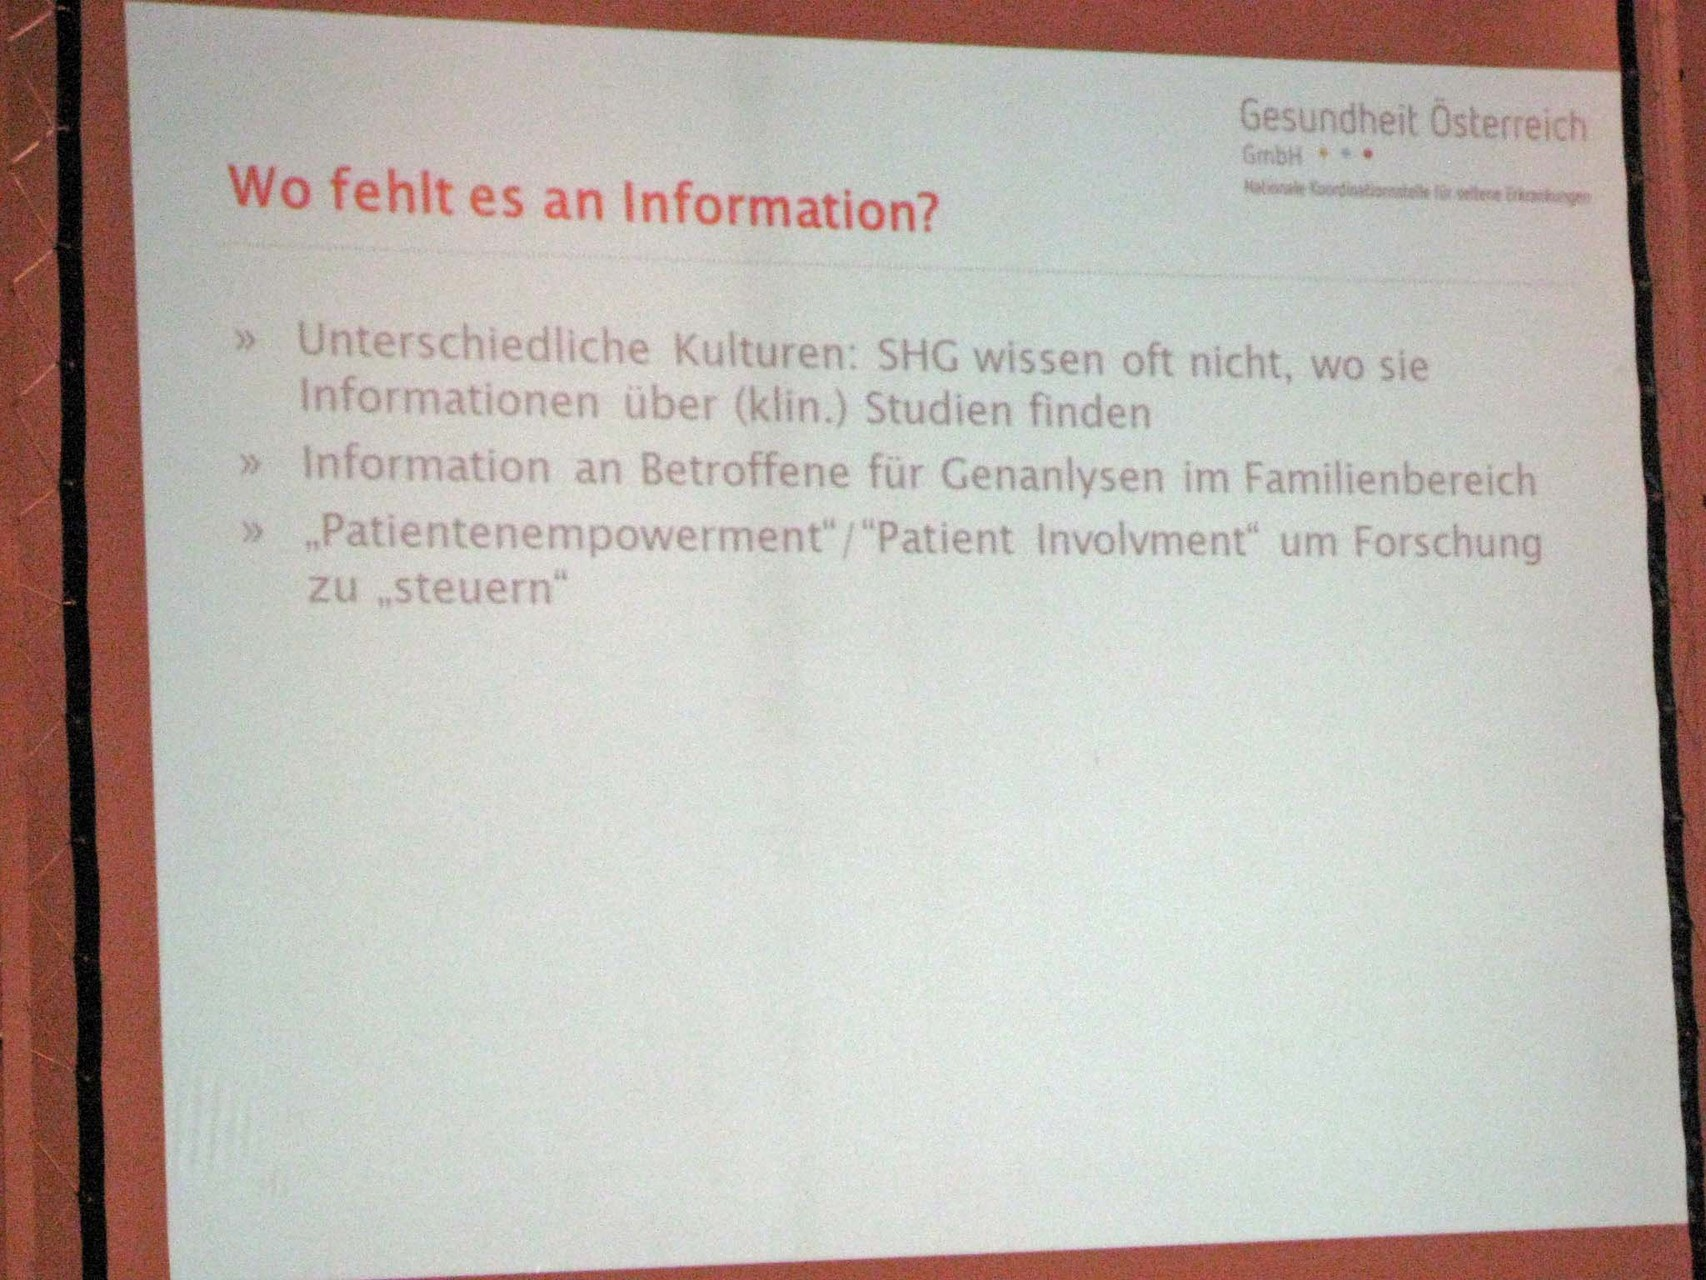 Wo fehlt es an Information?